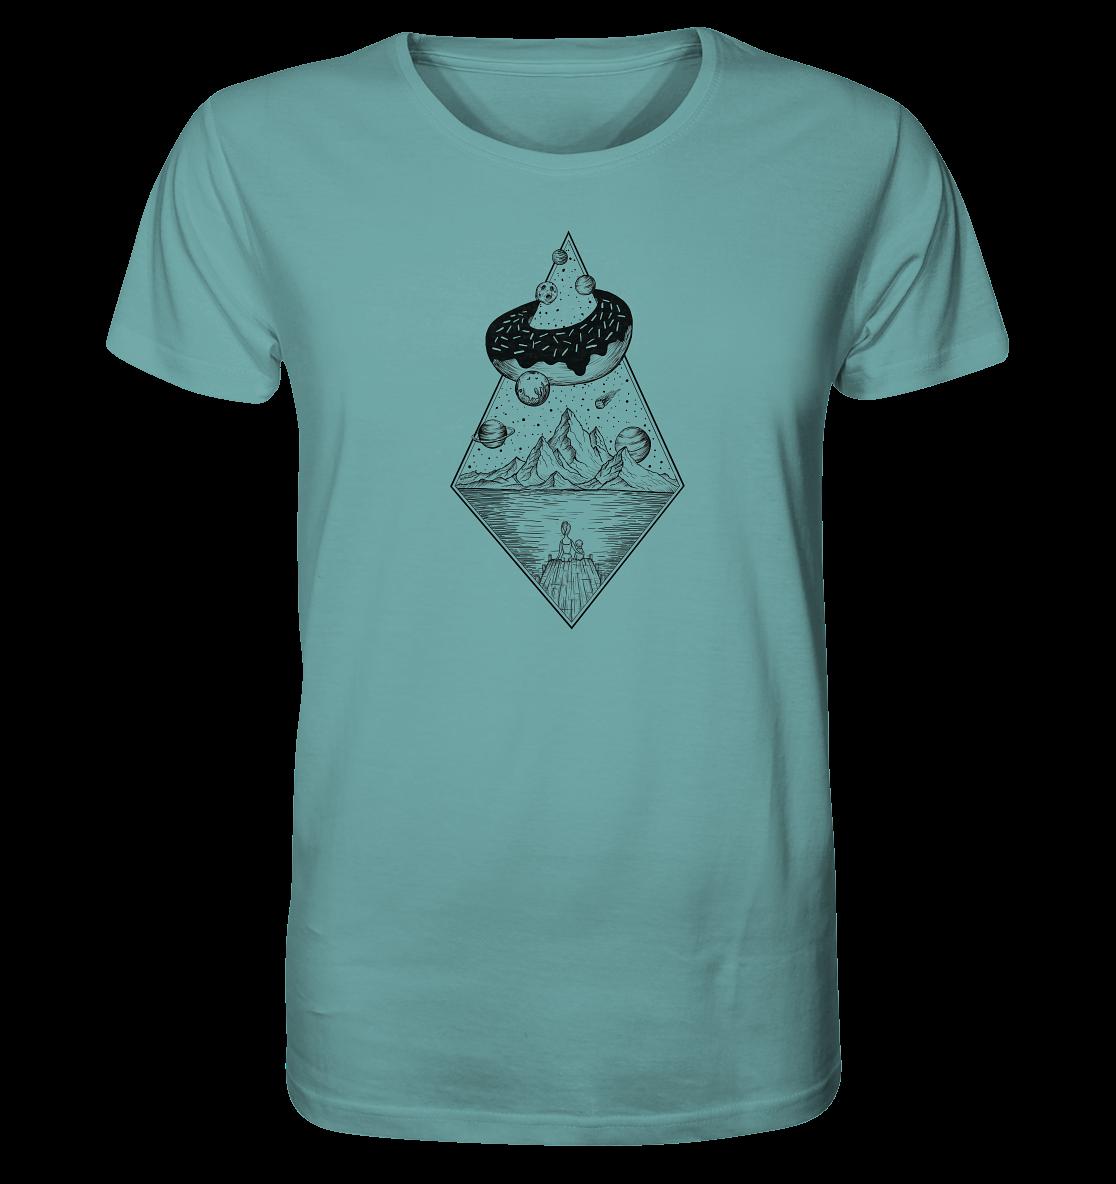 front-organic-shirt-70a7a7-1116x-1.png